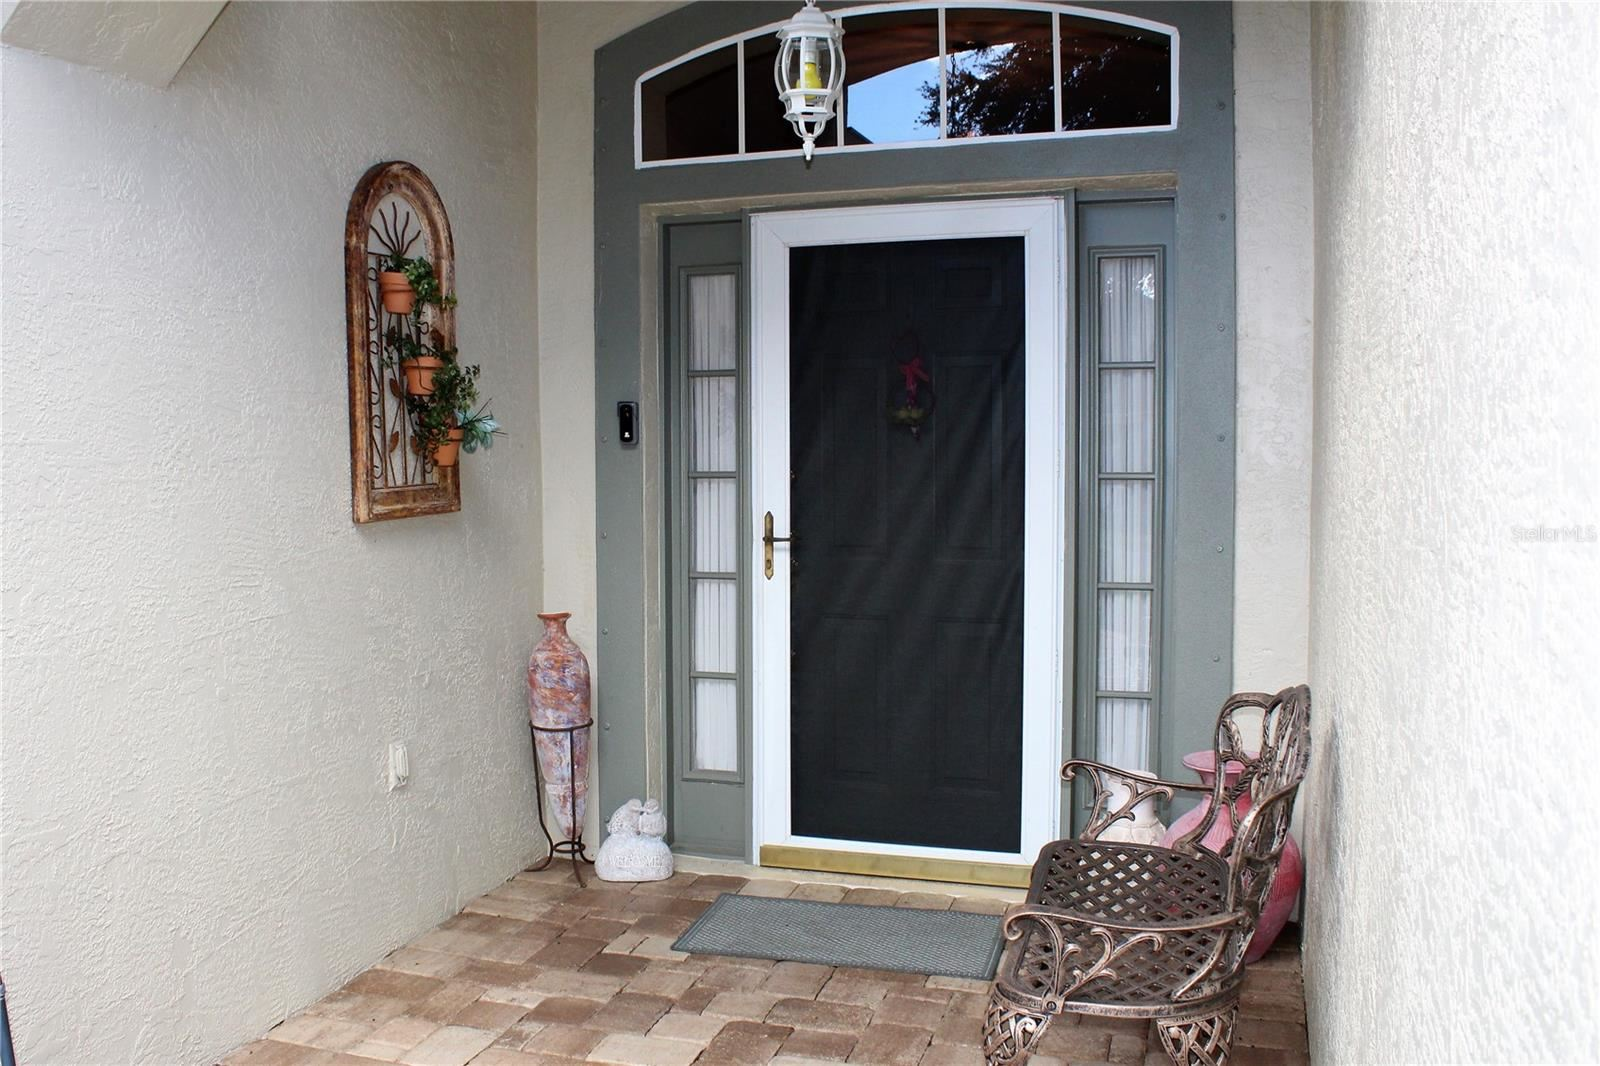 Photo of 2236 ADDISON AVENUE, CLERMONT, FL 34711 (MLS # G5047103)